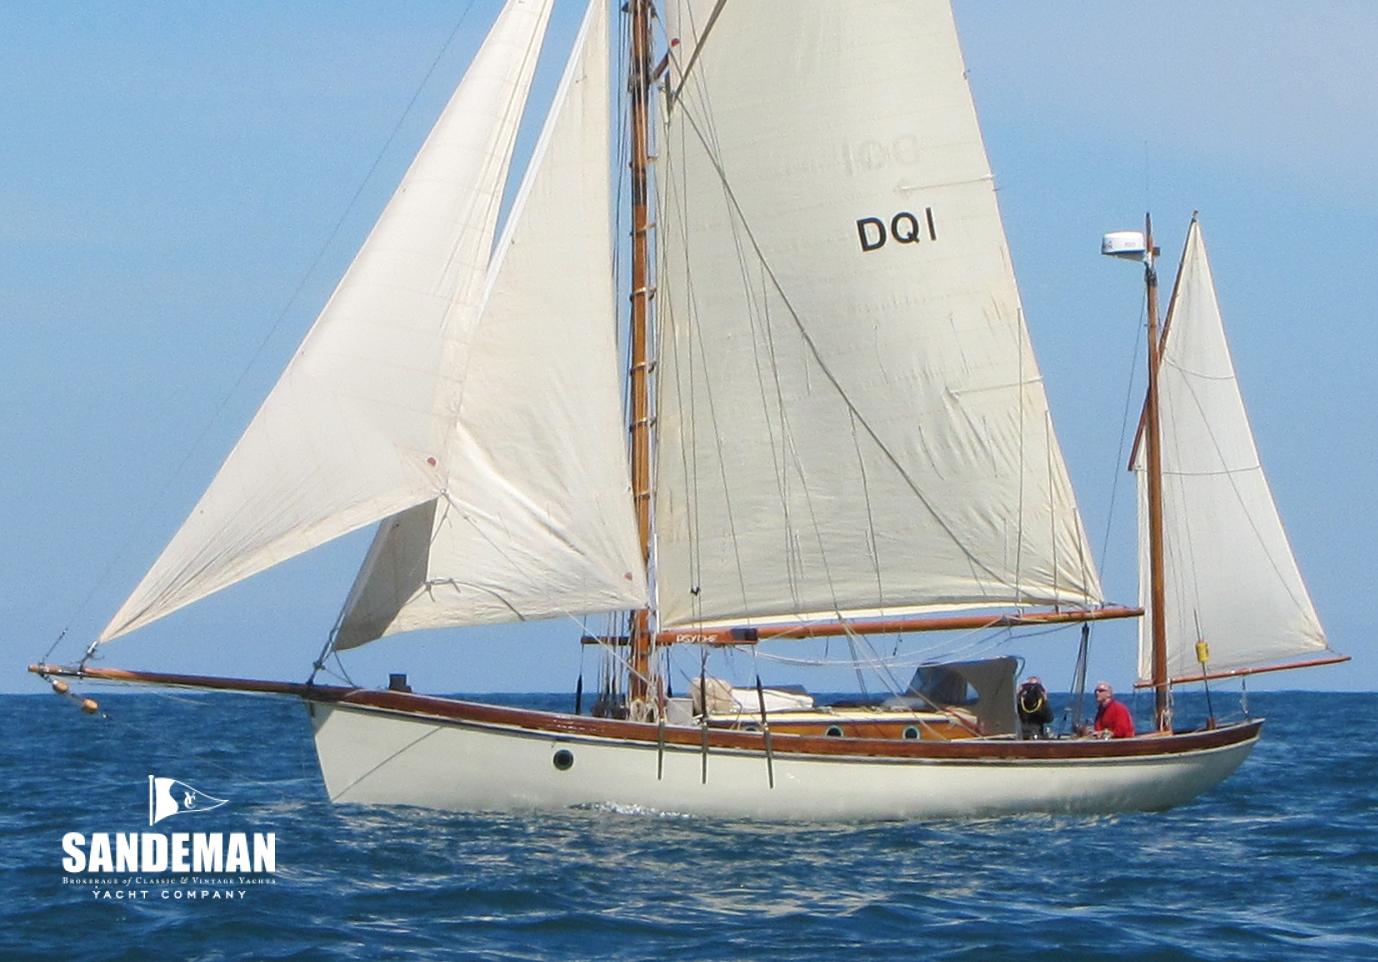 Ed Burnett 38 ft Gaff Yawl 2000 - Sandeman Yacht Company